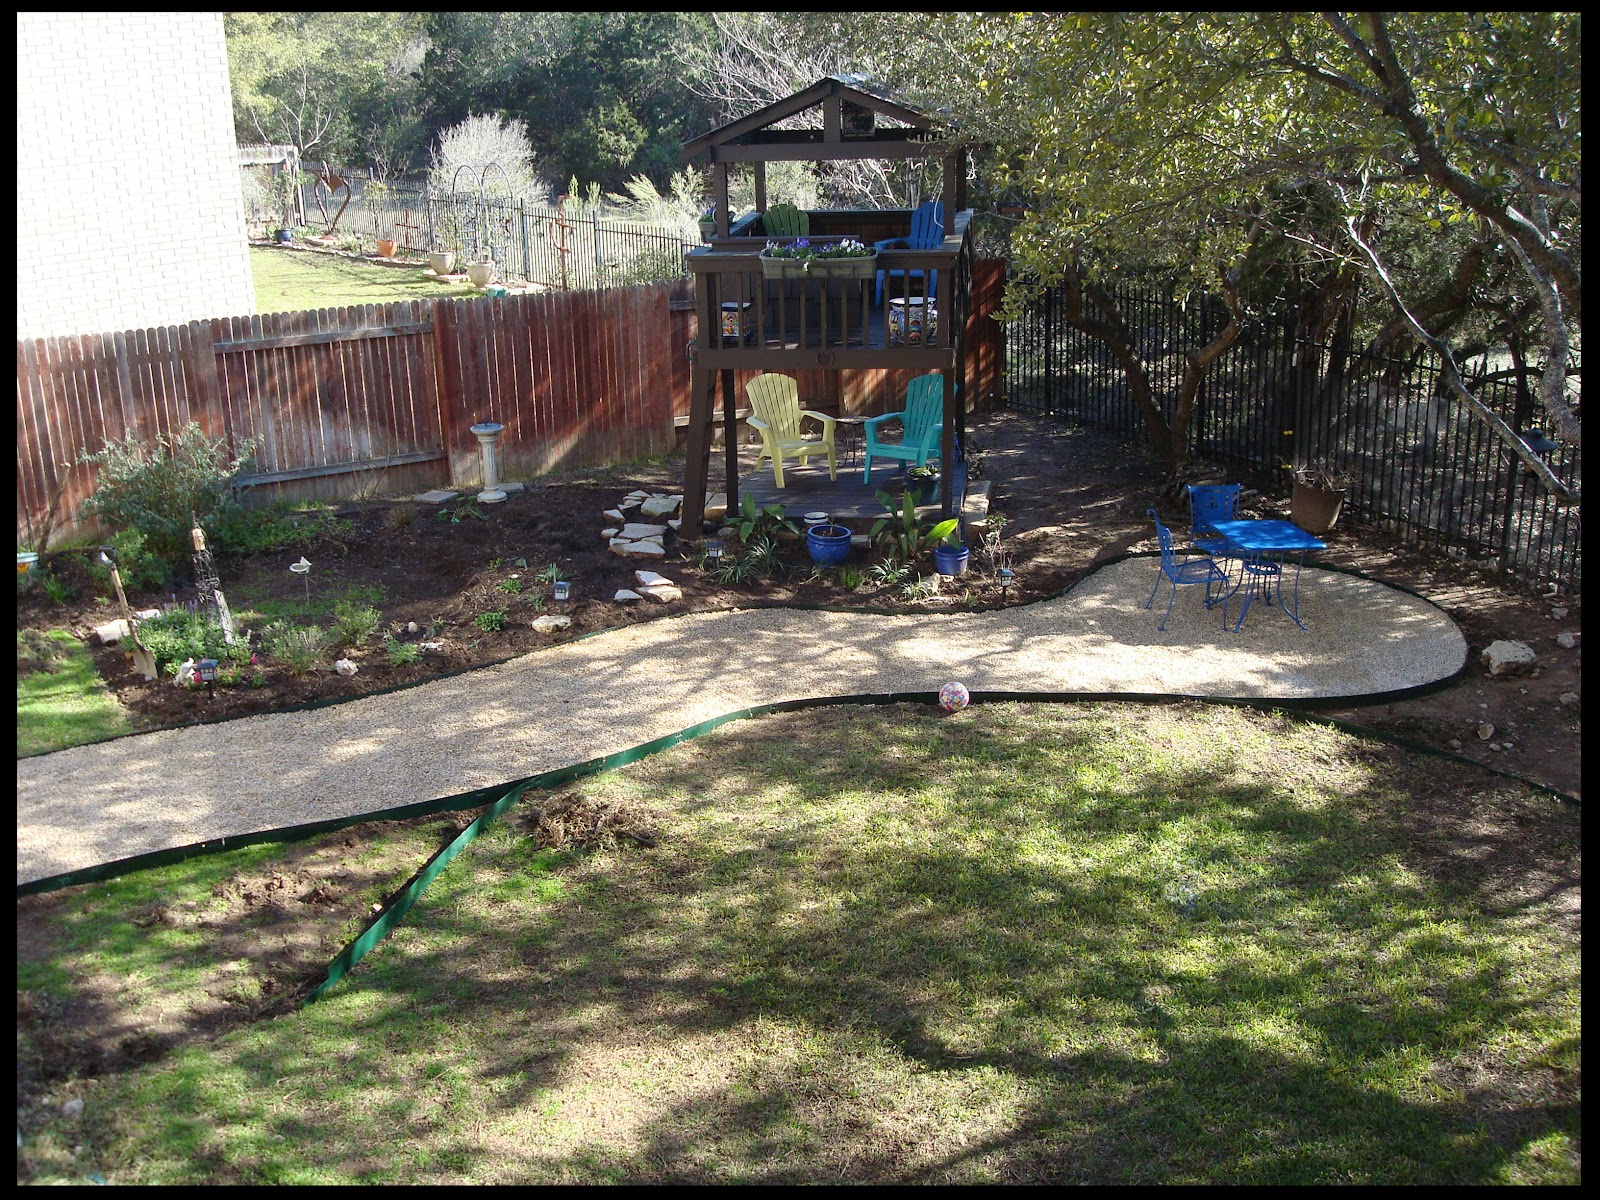 garden path wanderings one project down